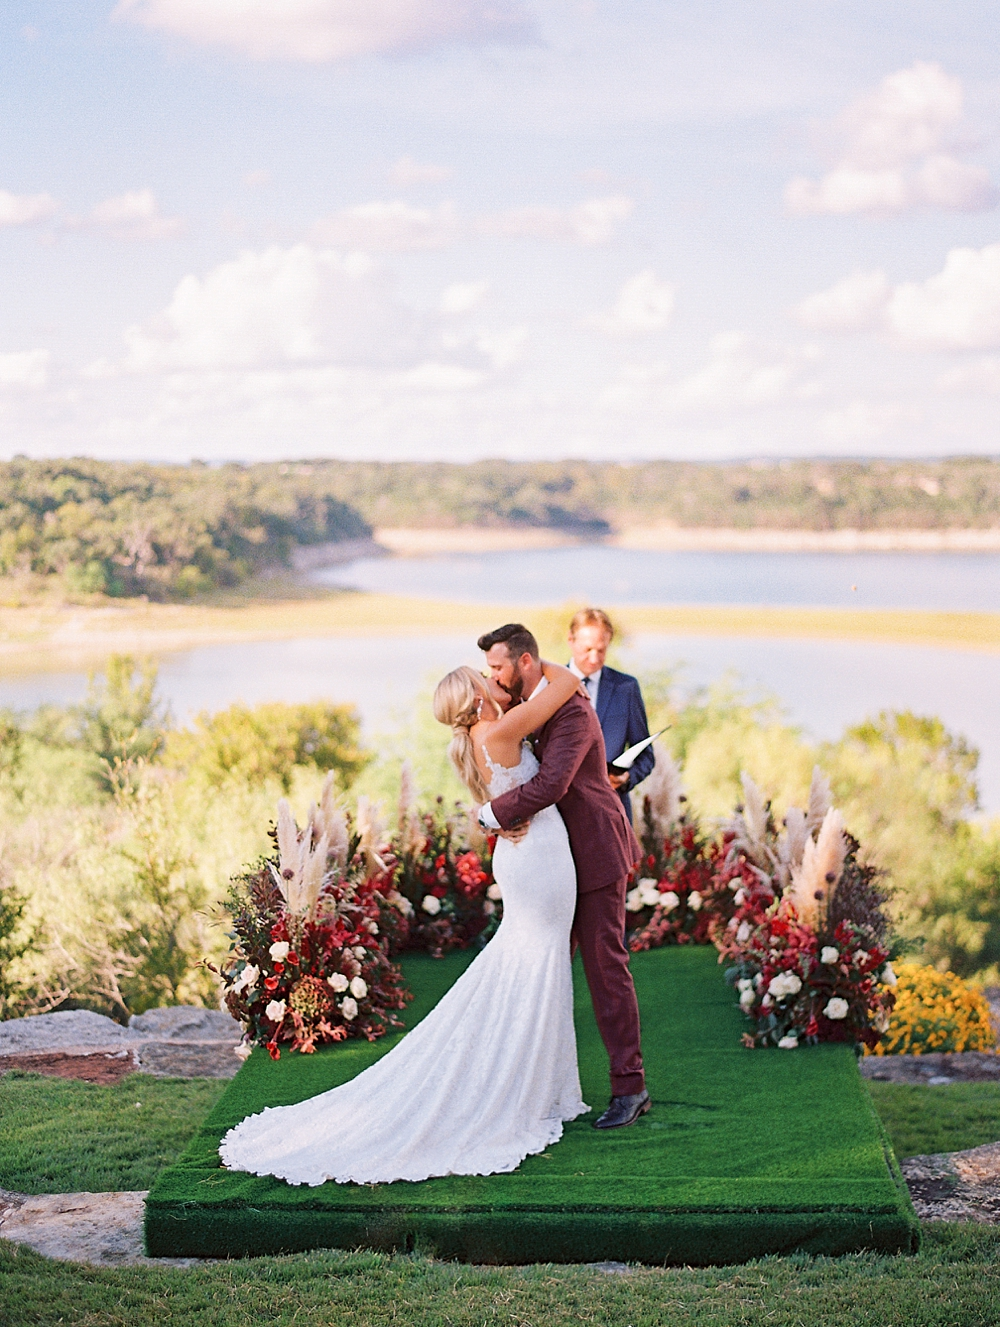 kristin-la-voie-photography-AUSTIN-WEDDING-PHOTOGRAPHER-BEST-IN-TEXAS-87